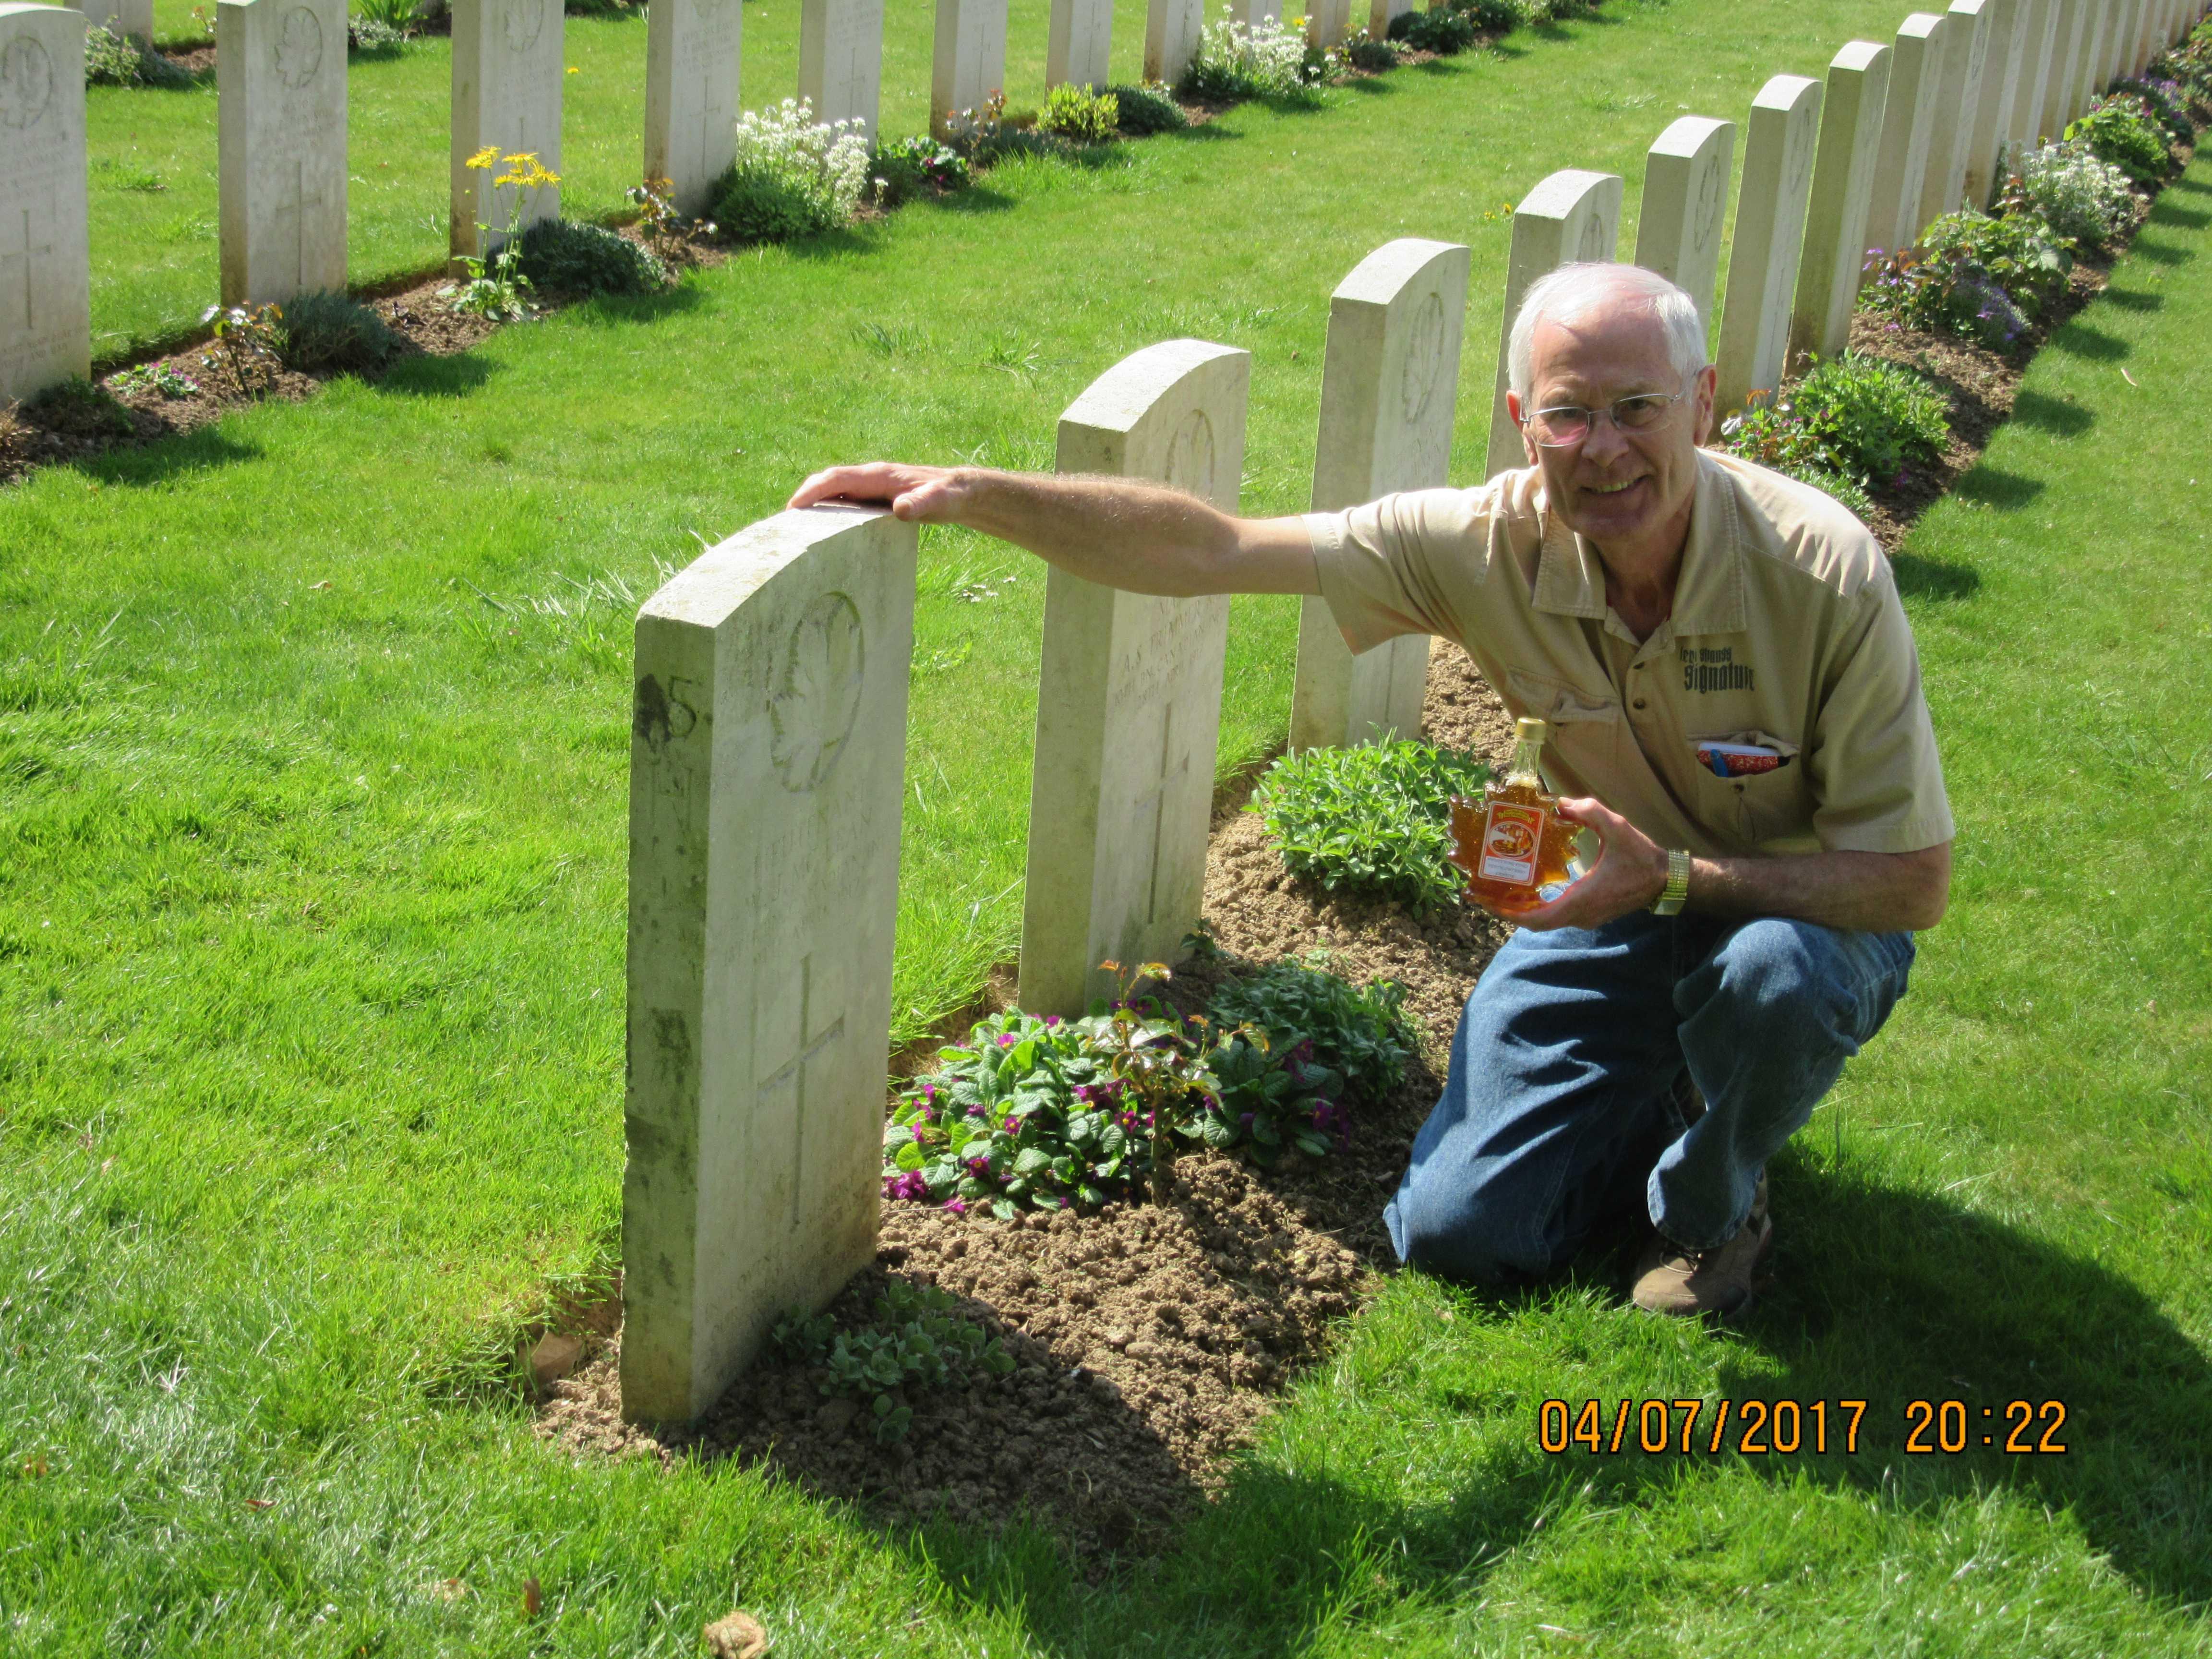 Grave Marker– Tom Spence at Williams grave on April 8,2017